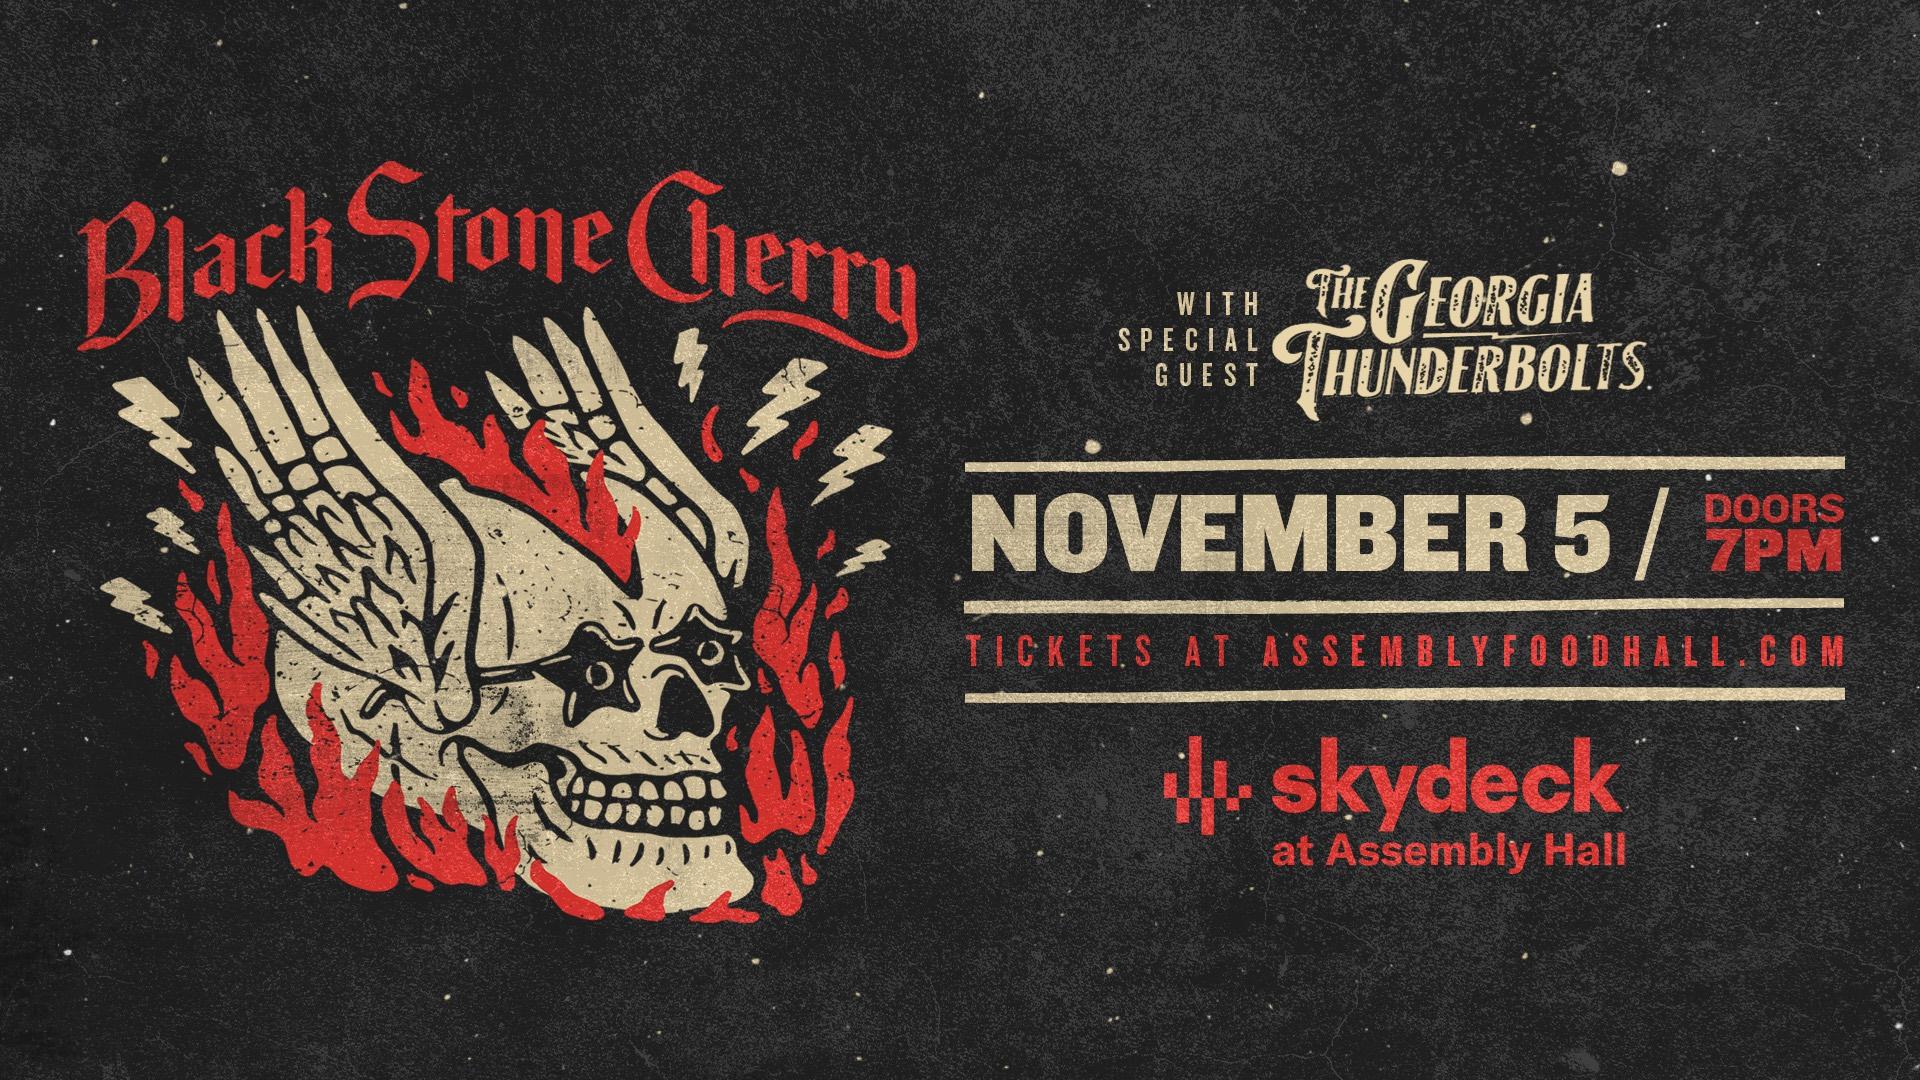 Promo image of Black Stone Cherry on Skydeck